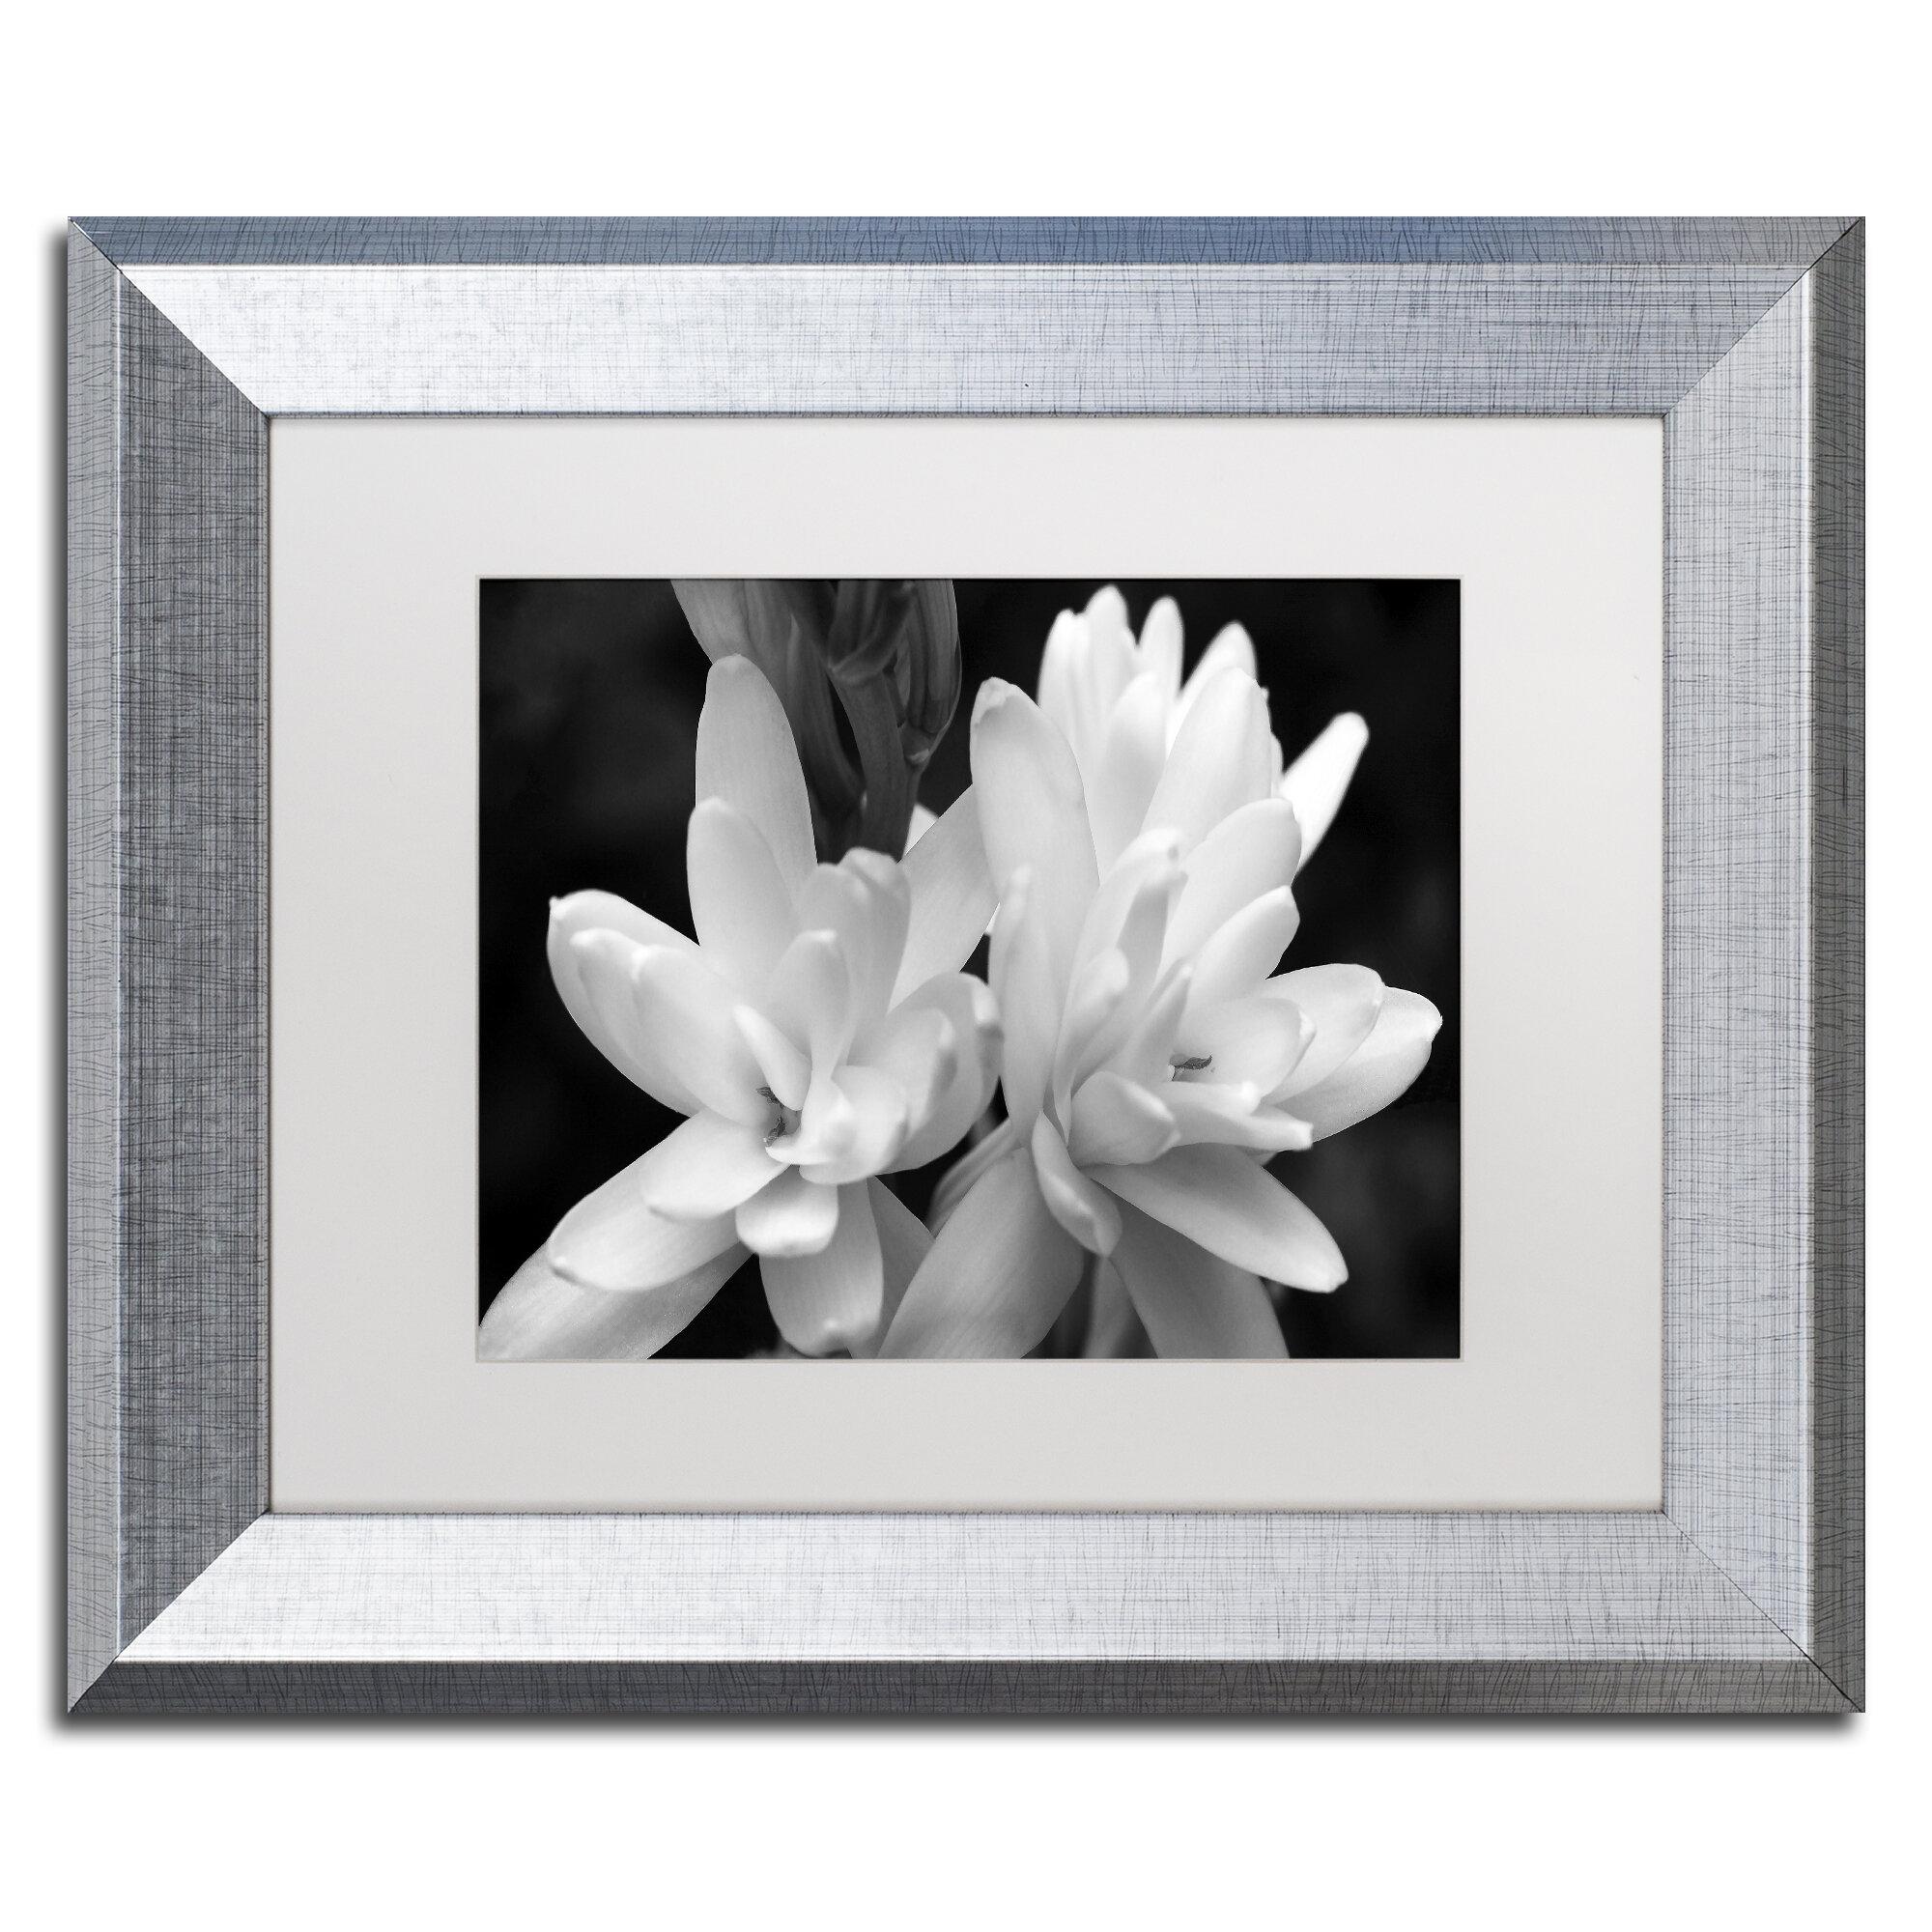 Latitude Run Tuber Rose In Black And White Framed Photographic Print Wayfair